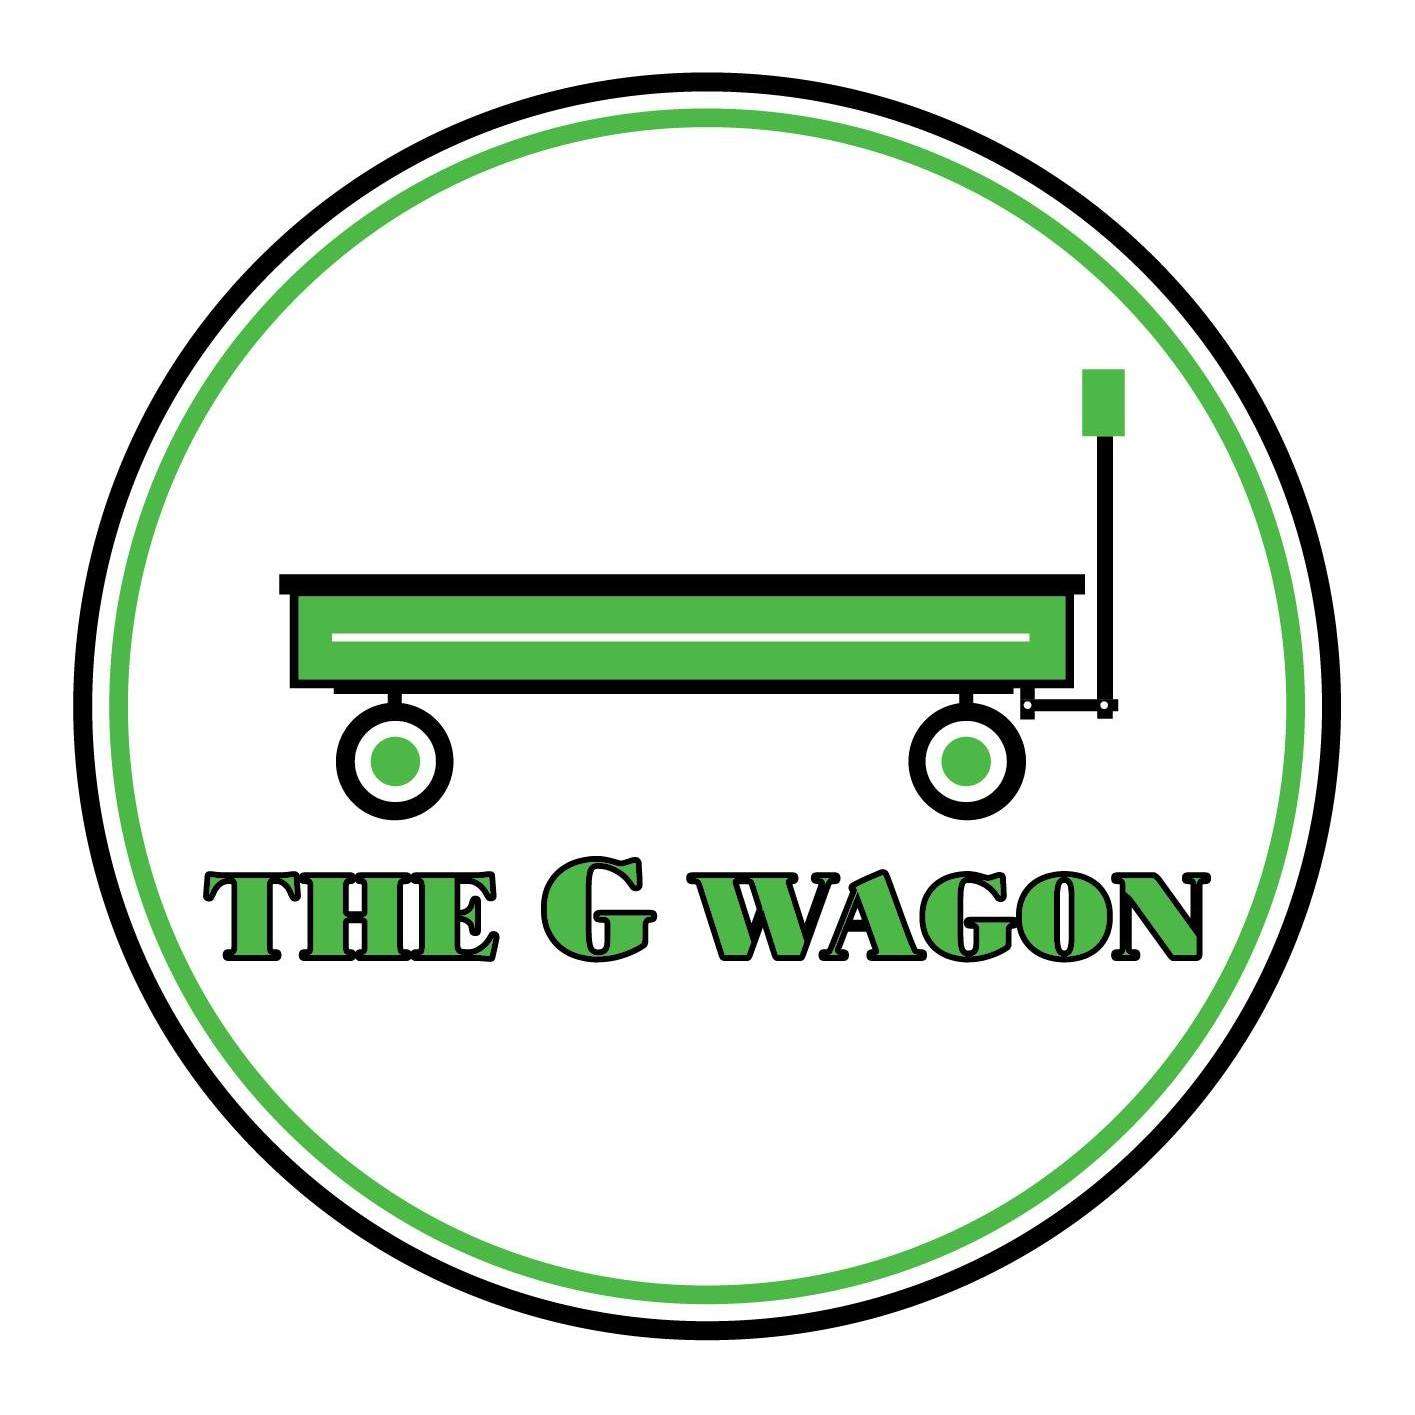 The G Wagon logo